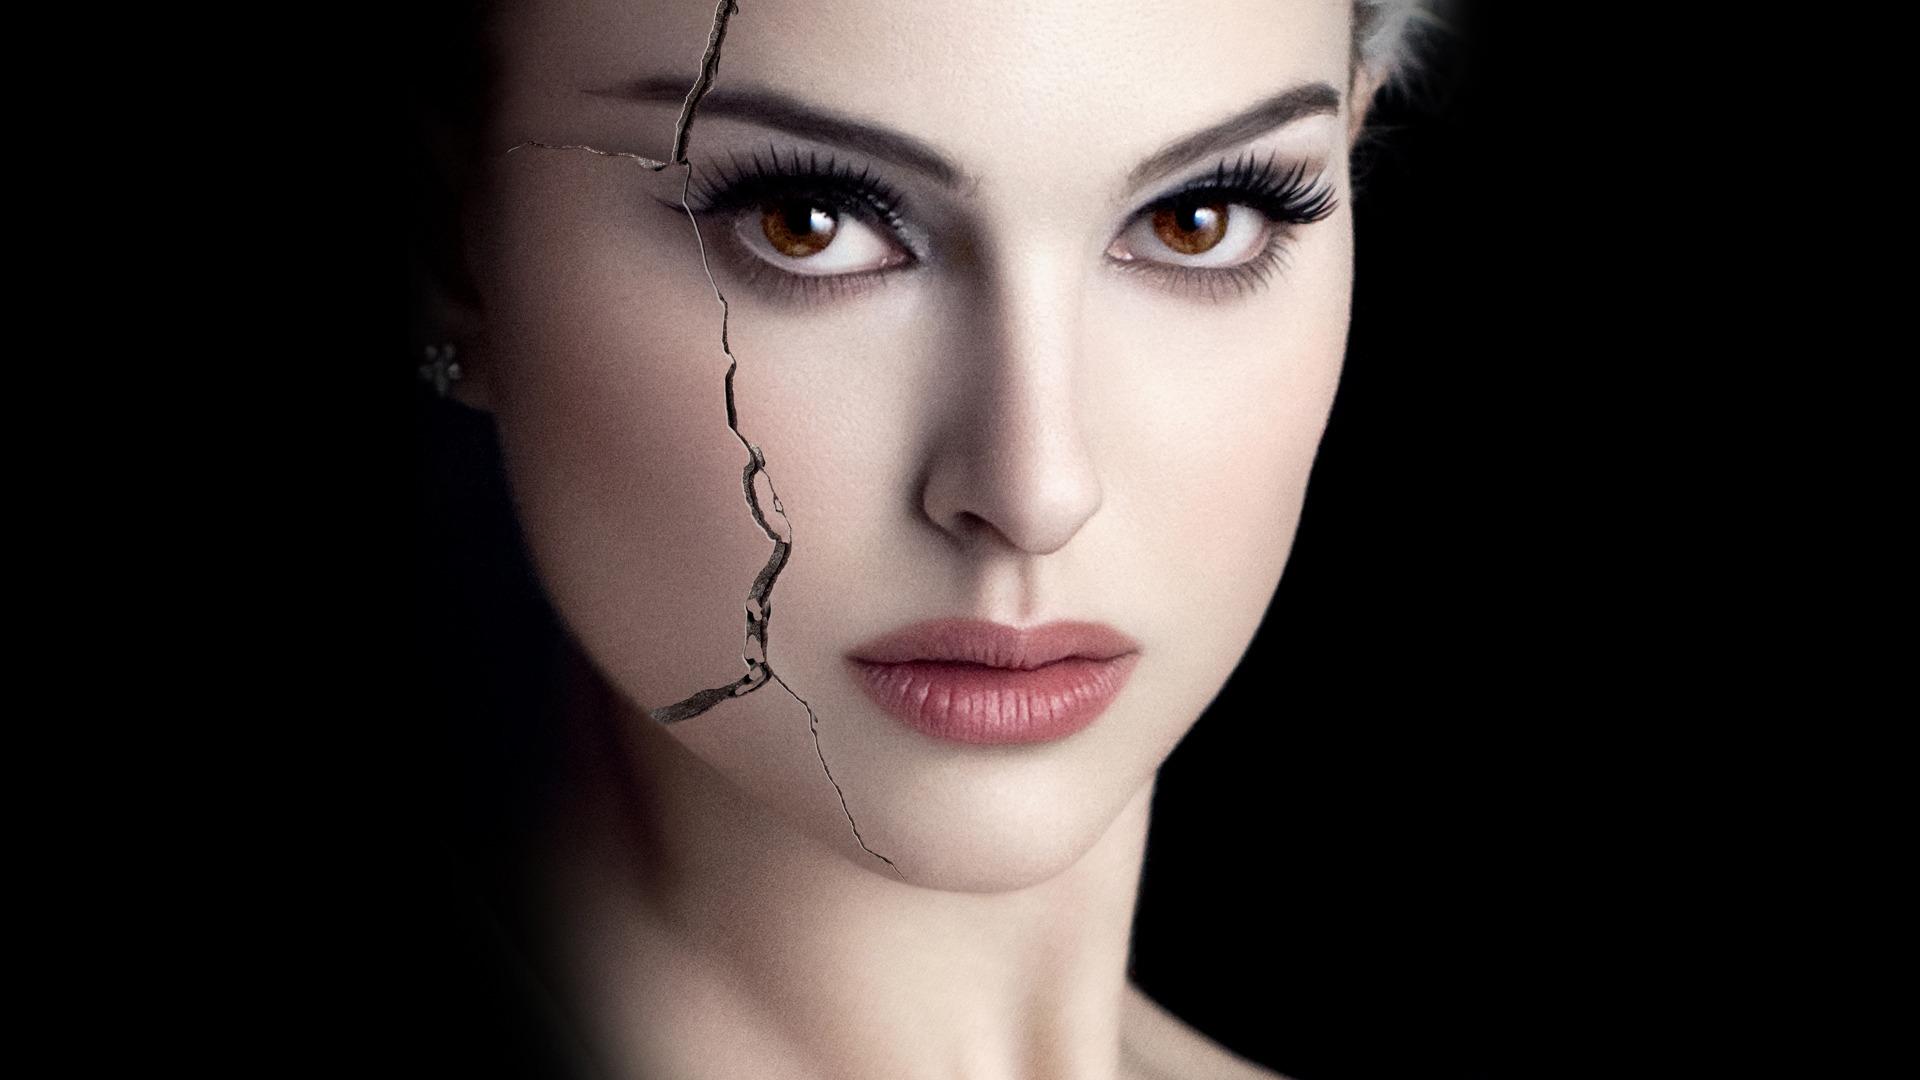 Natalie Portman Wide